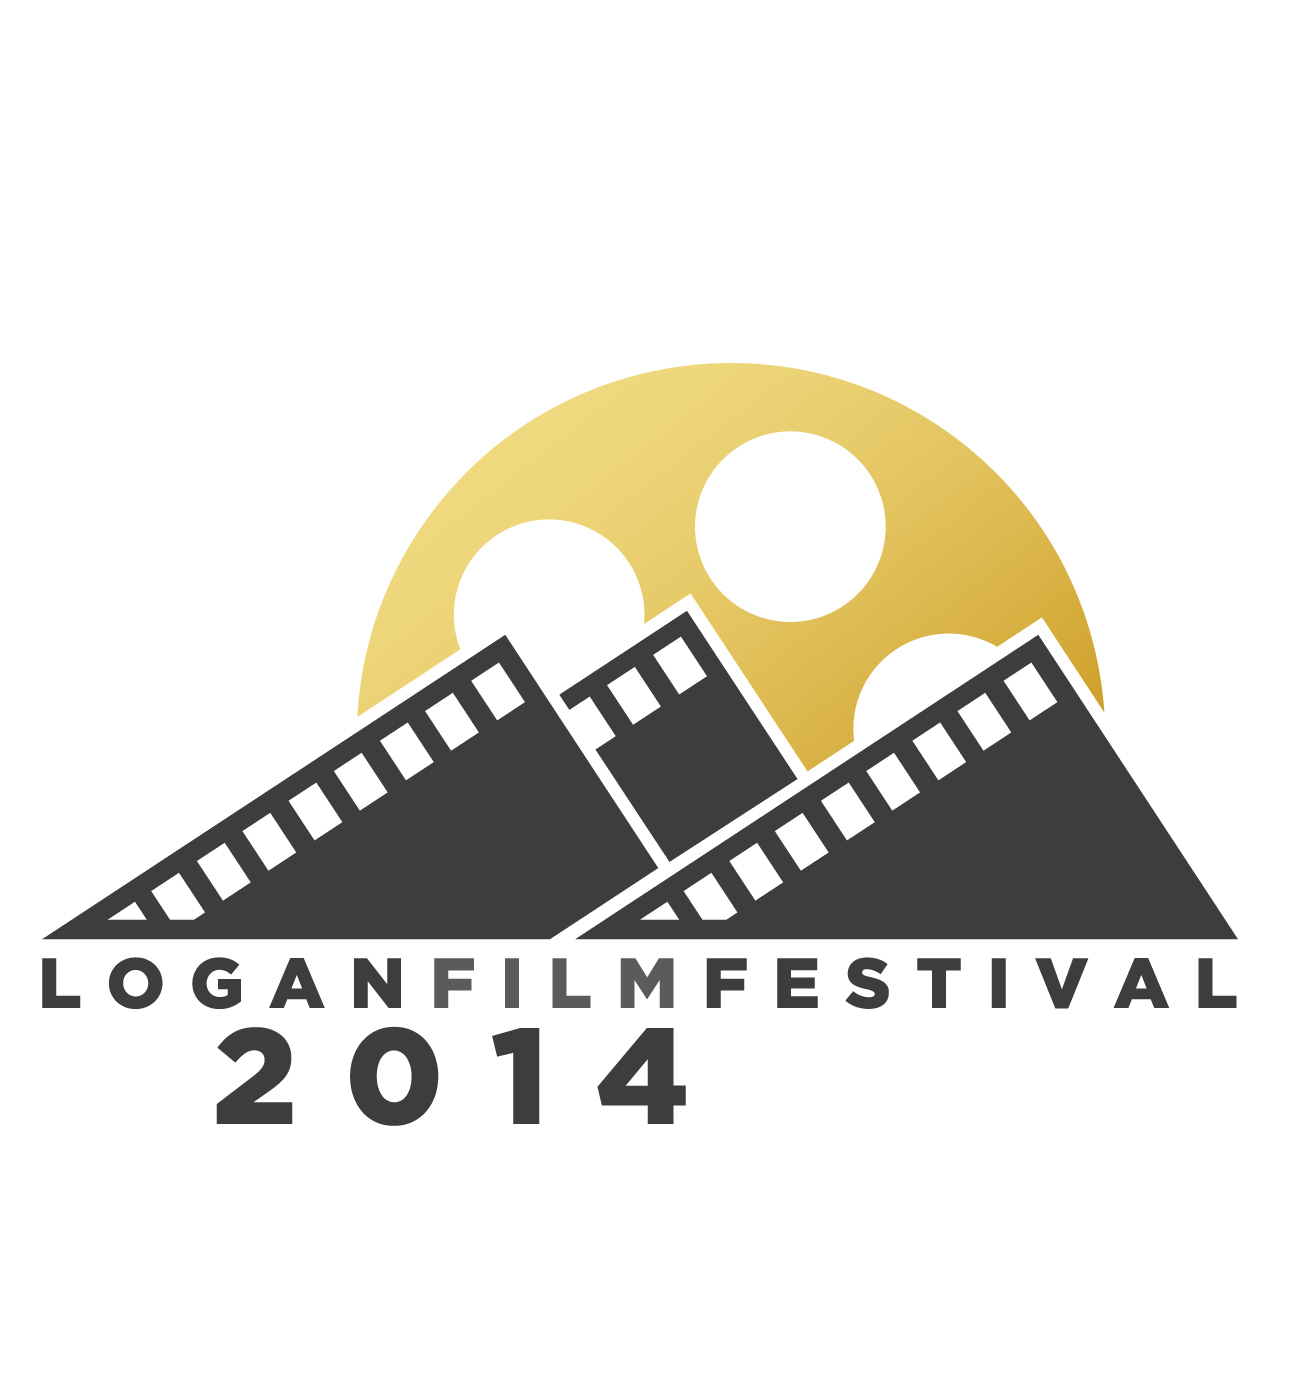 2014 LFF logo development -v10 main logo isolated